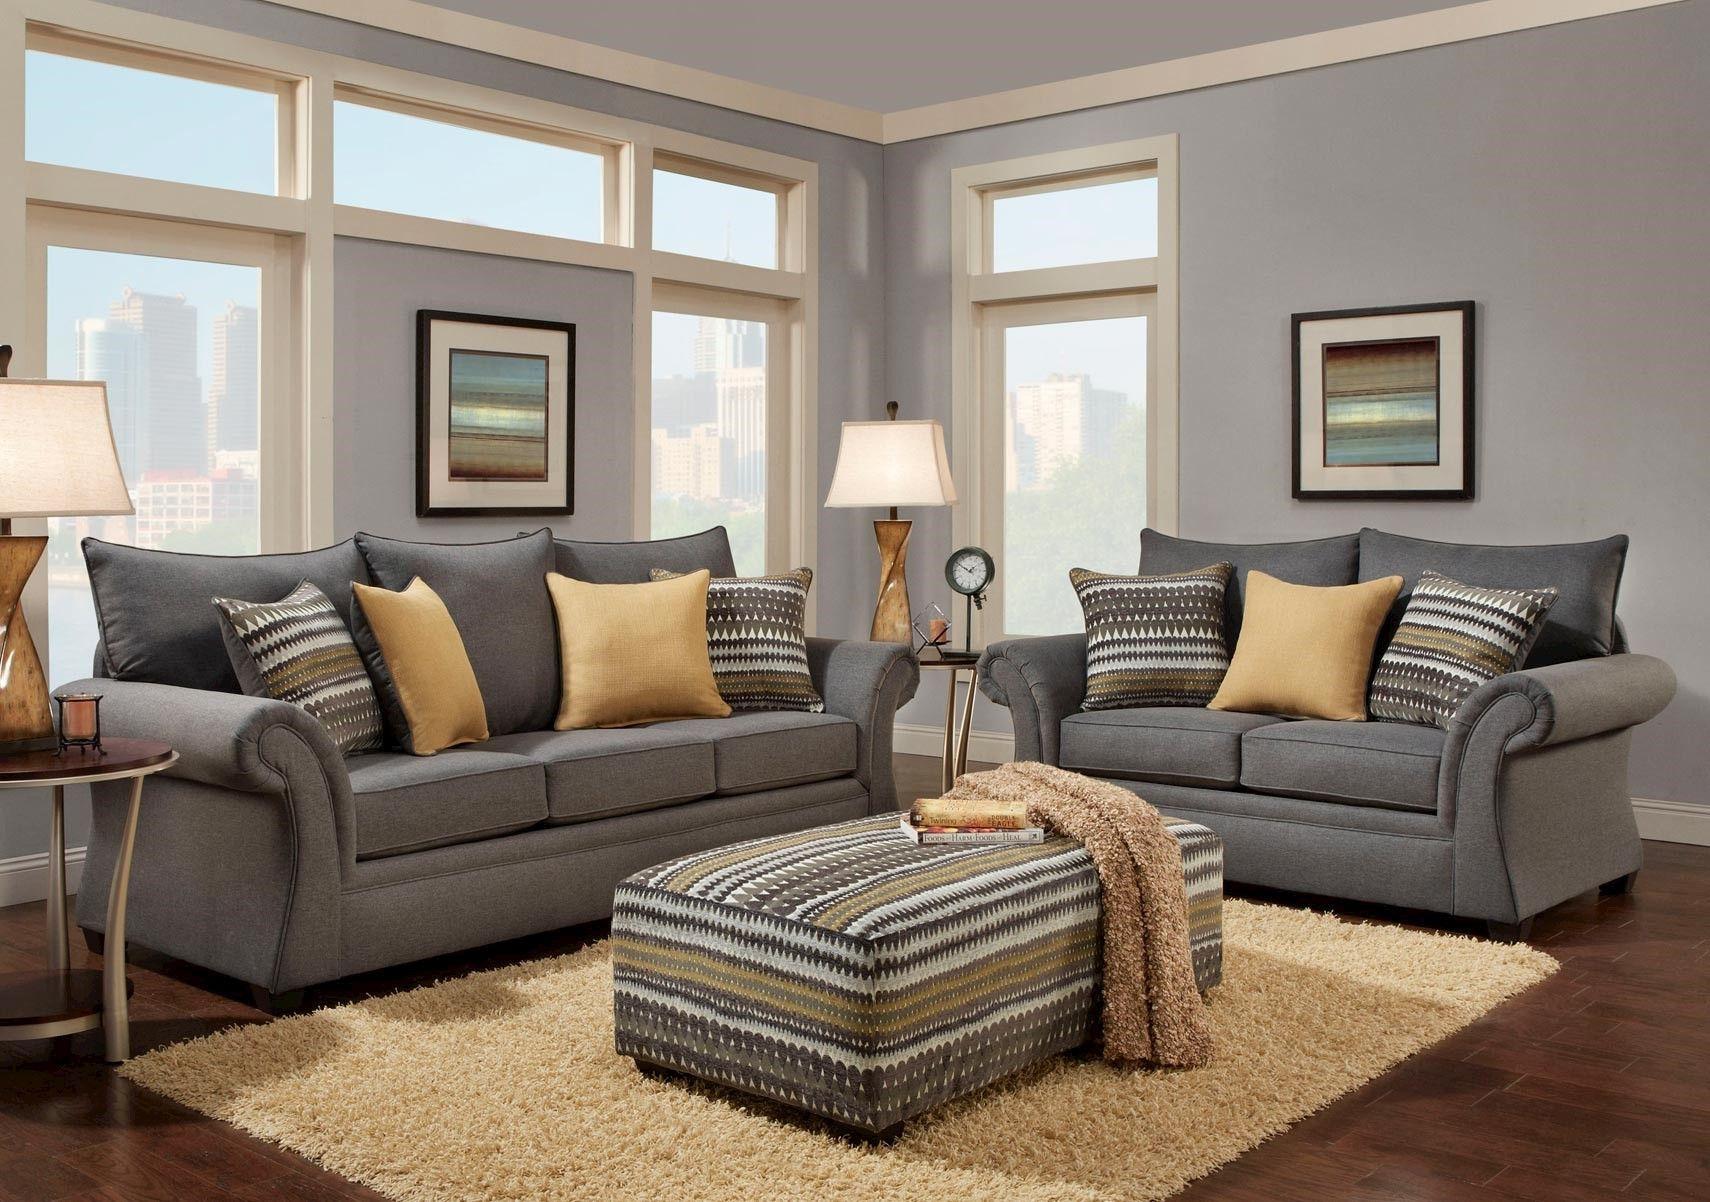 Lacks Jitterbug Gray 2 Pc Living Room Set Contemporary Living Room Sets Living Room Grey Living Room Color Schemes #photo #ideas #for #living #room